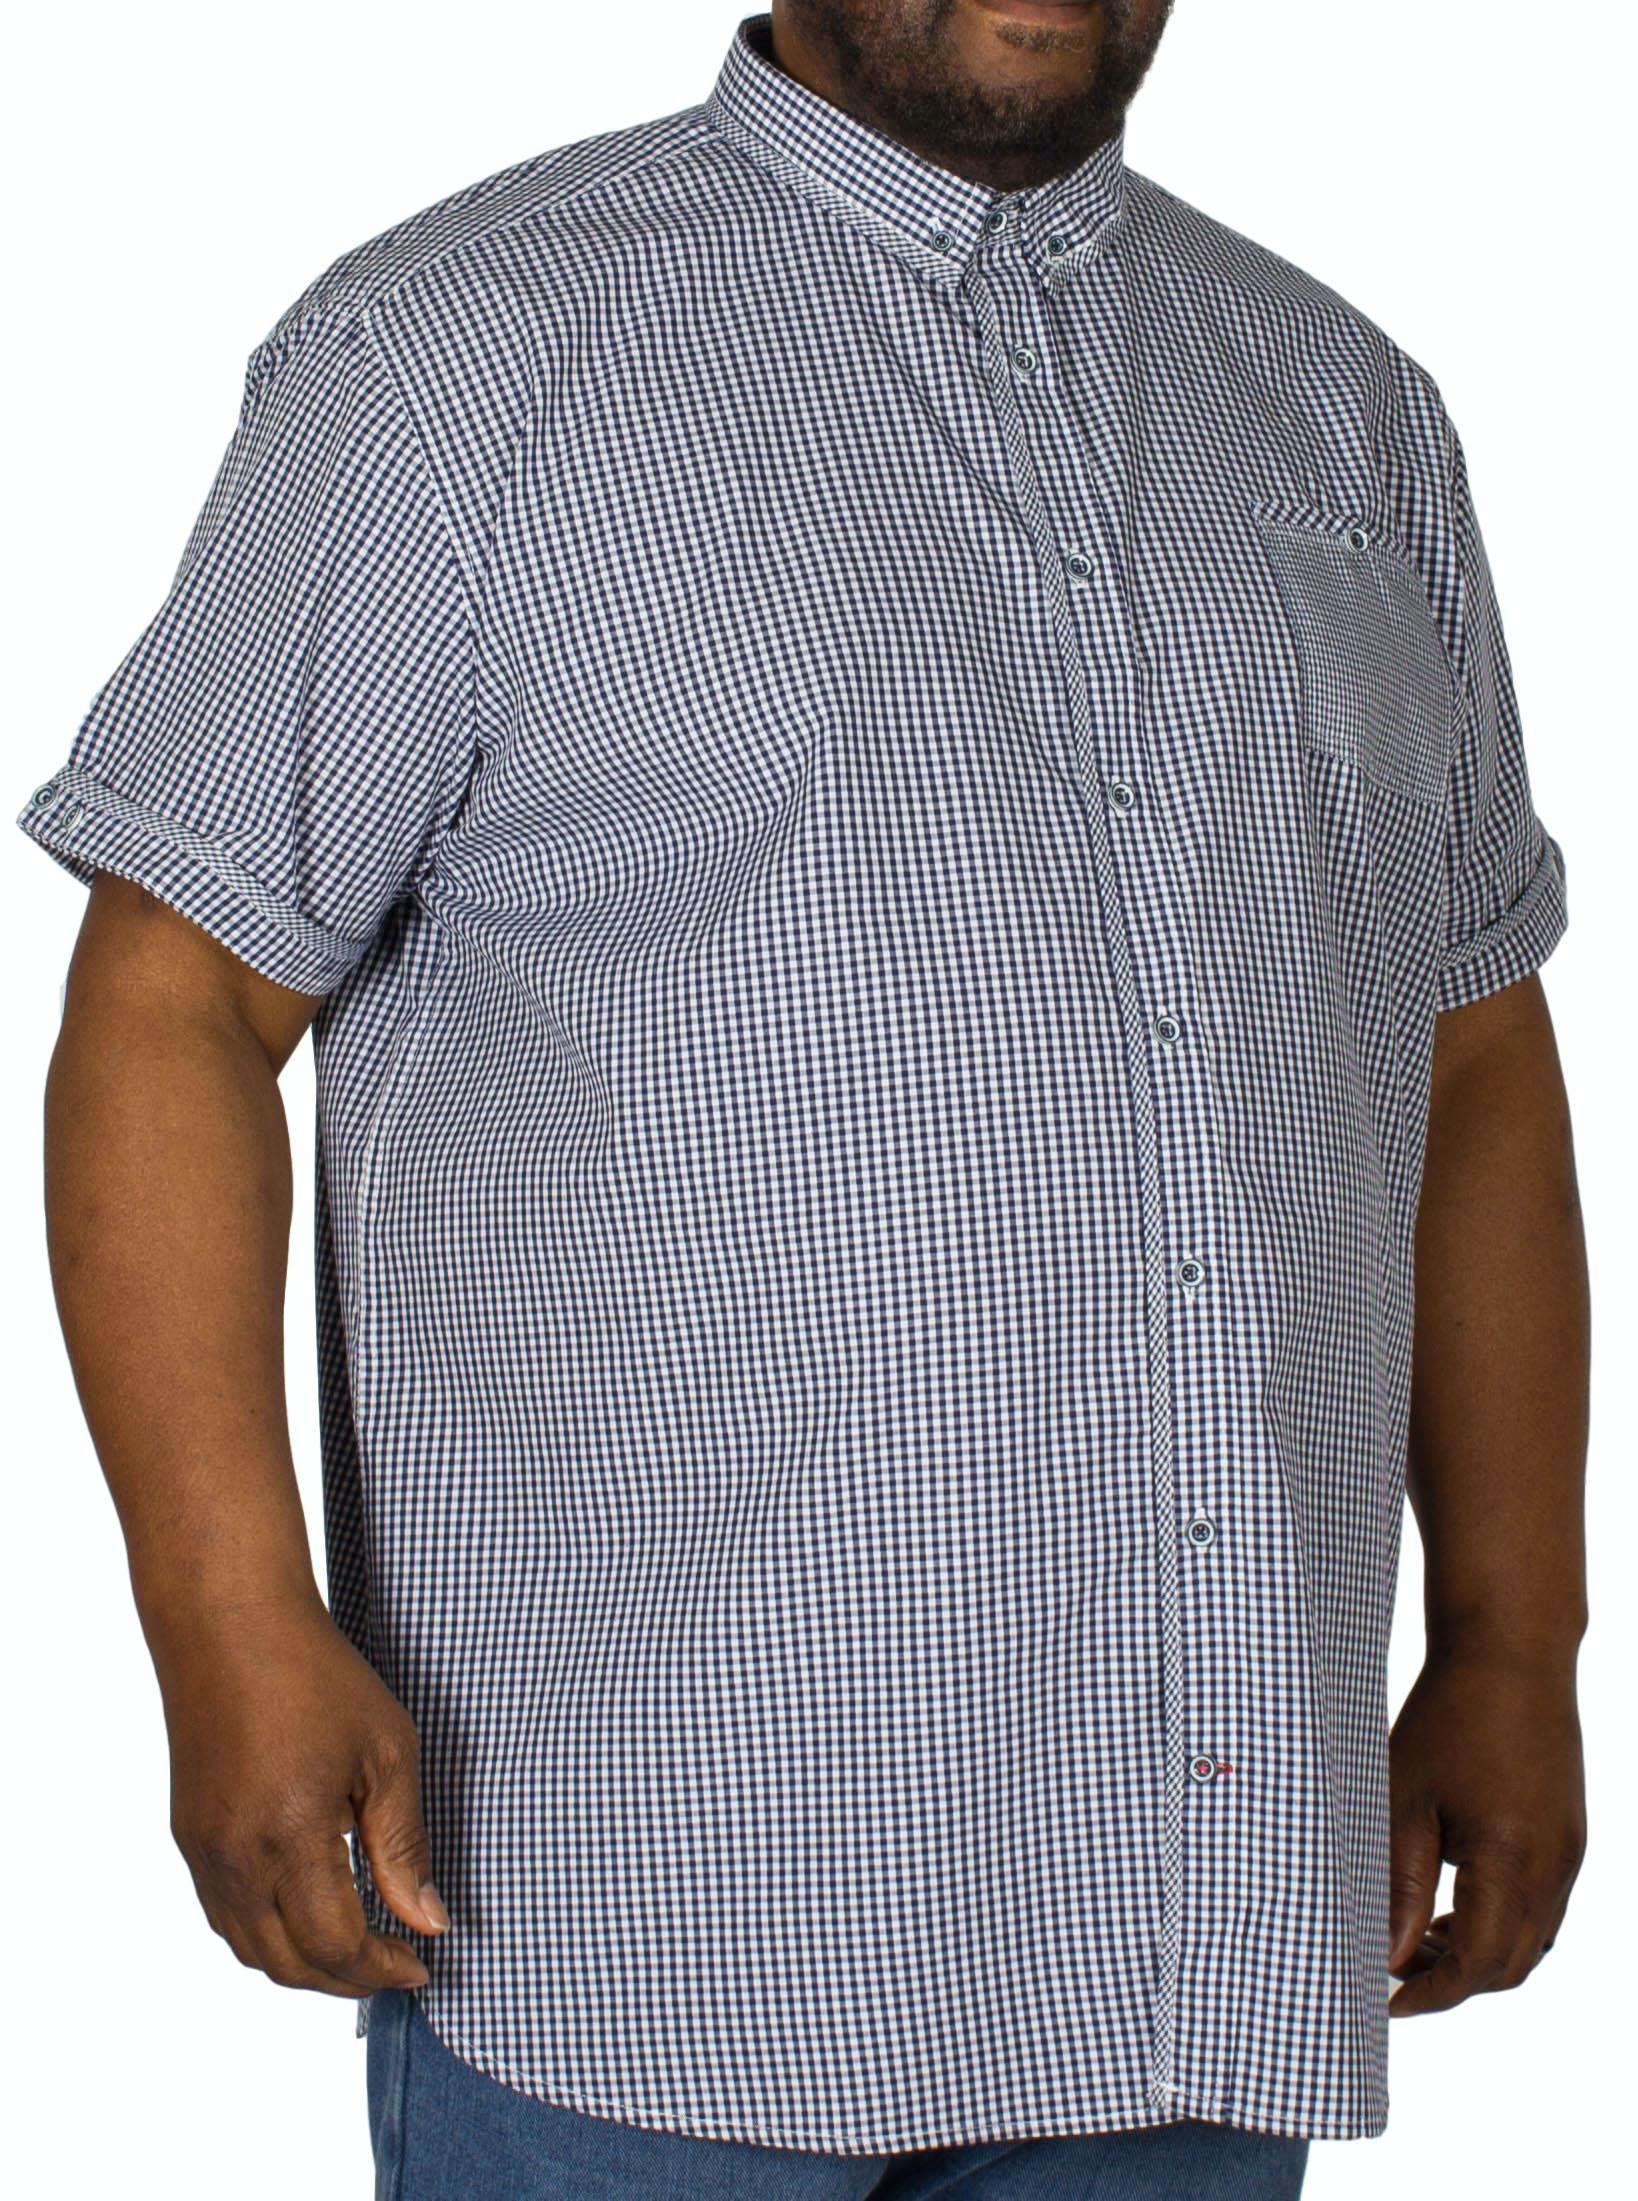 D555 Hank Gingham Check Shirt Navy/White